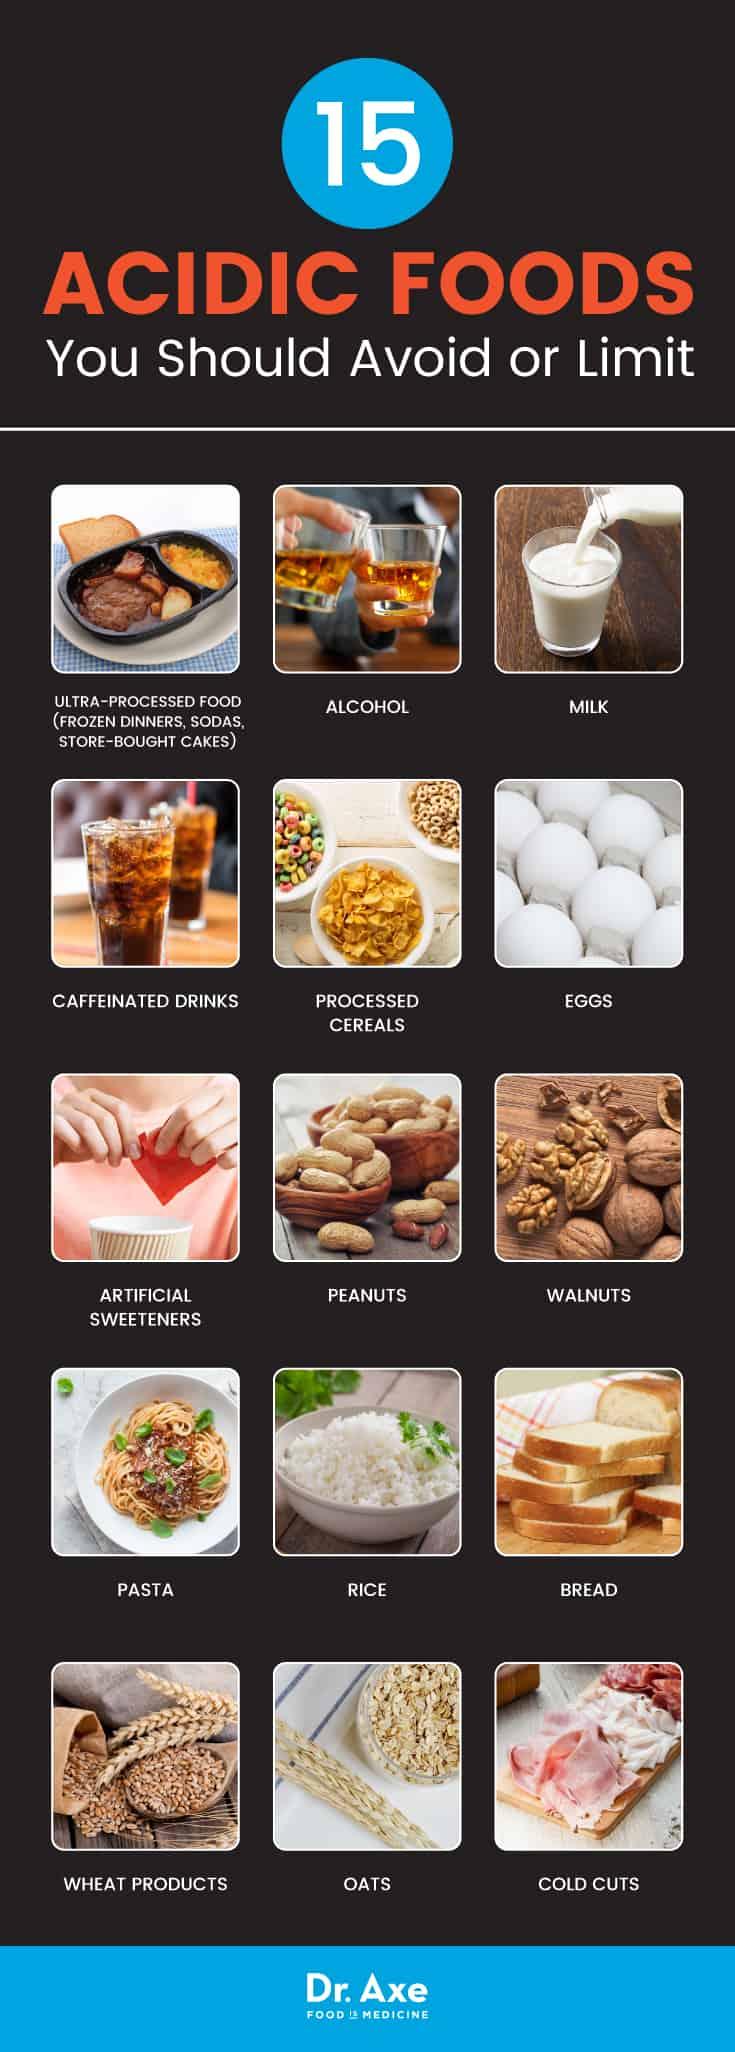 15 Acidic Foods To Avoid Healthier Alternatives